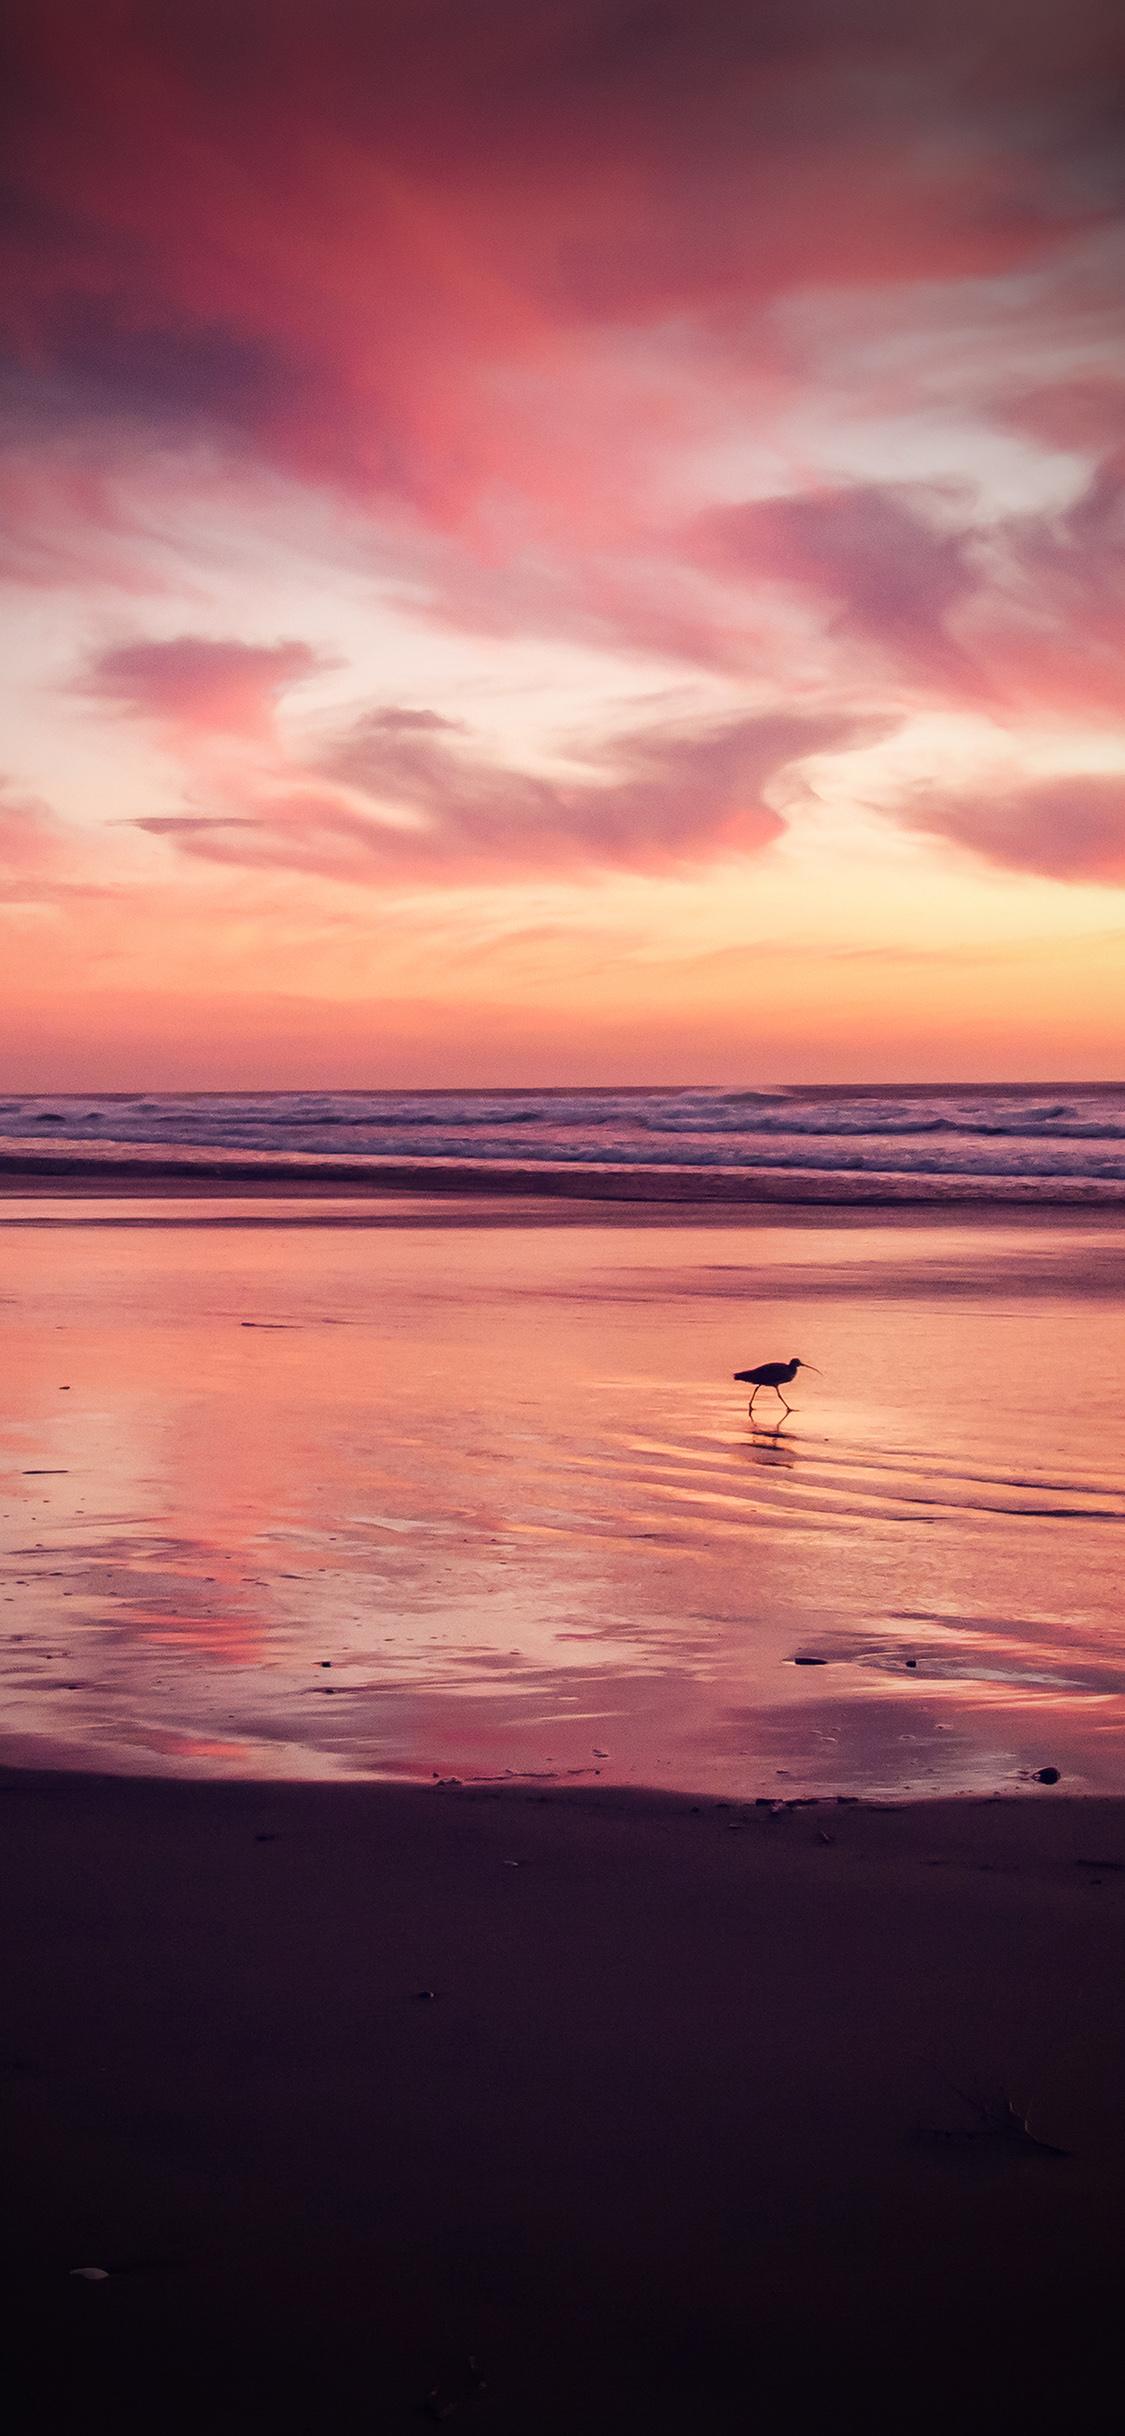 iPhoneXpapers.com-Apple-iPhone-wallpaper-mv57-sunset-beach-bird-red-orange-nature-sea-vignette